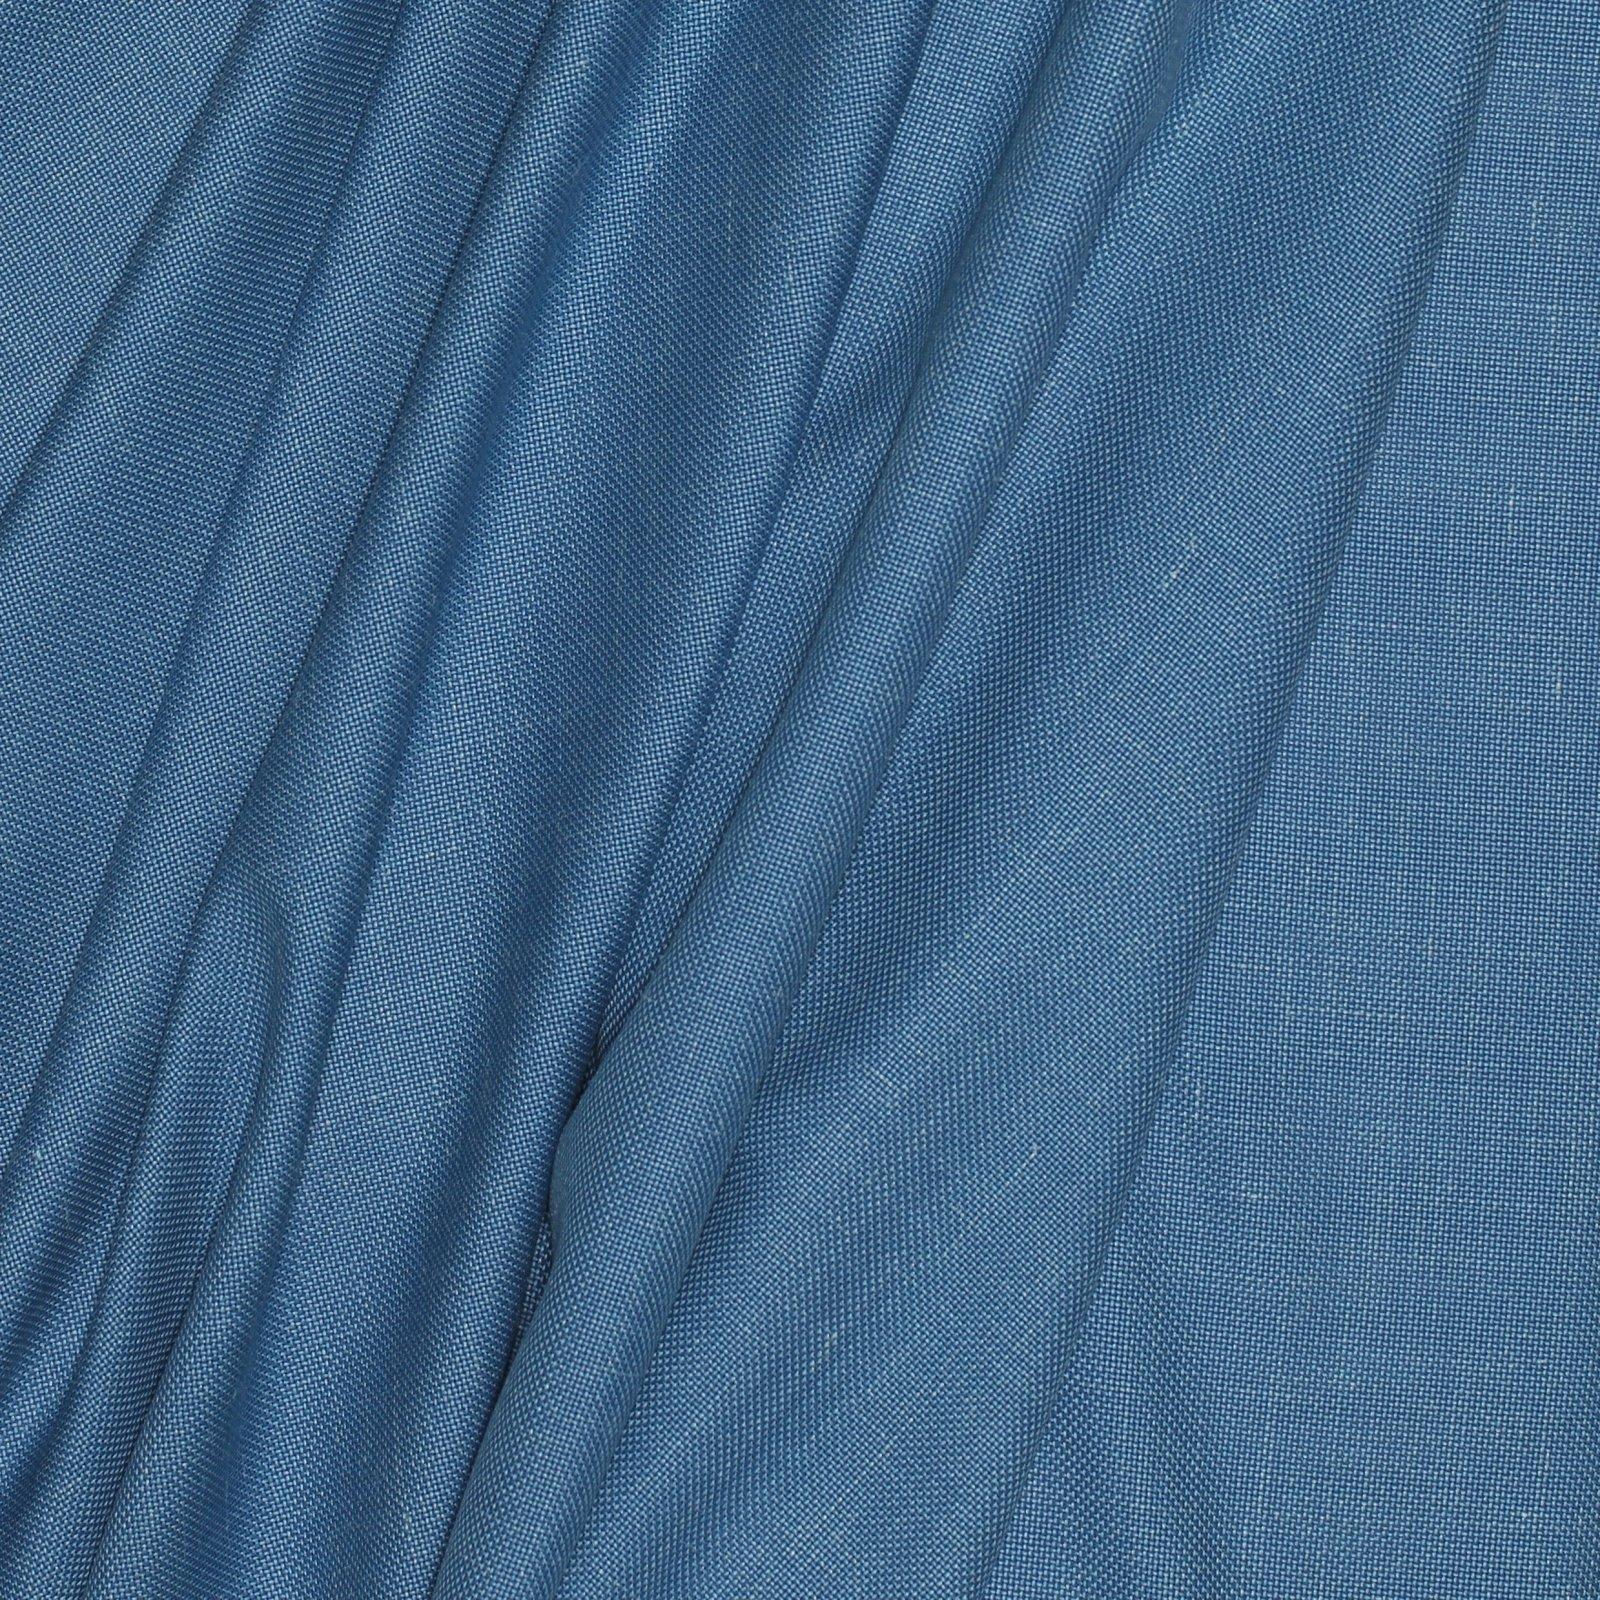 Sky Blue/Linen Silk Italian Tweed